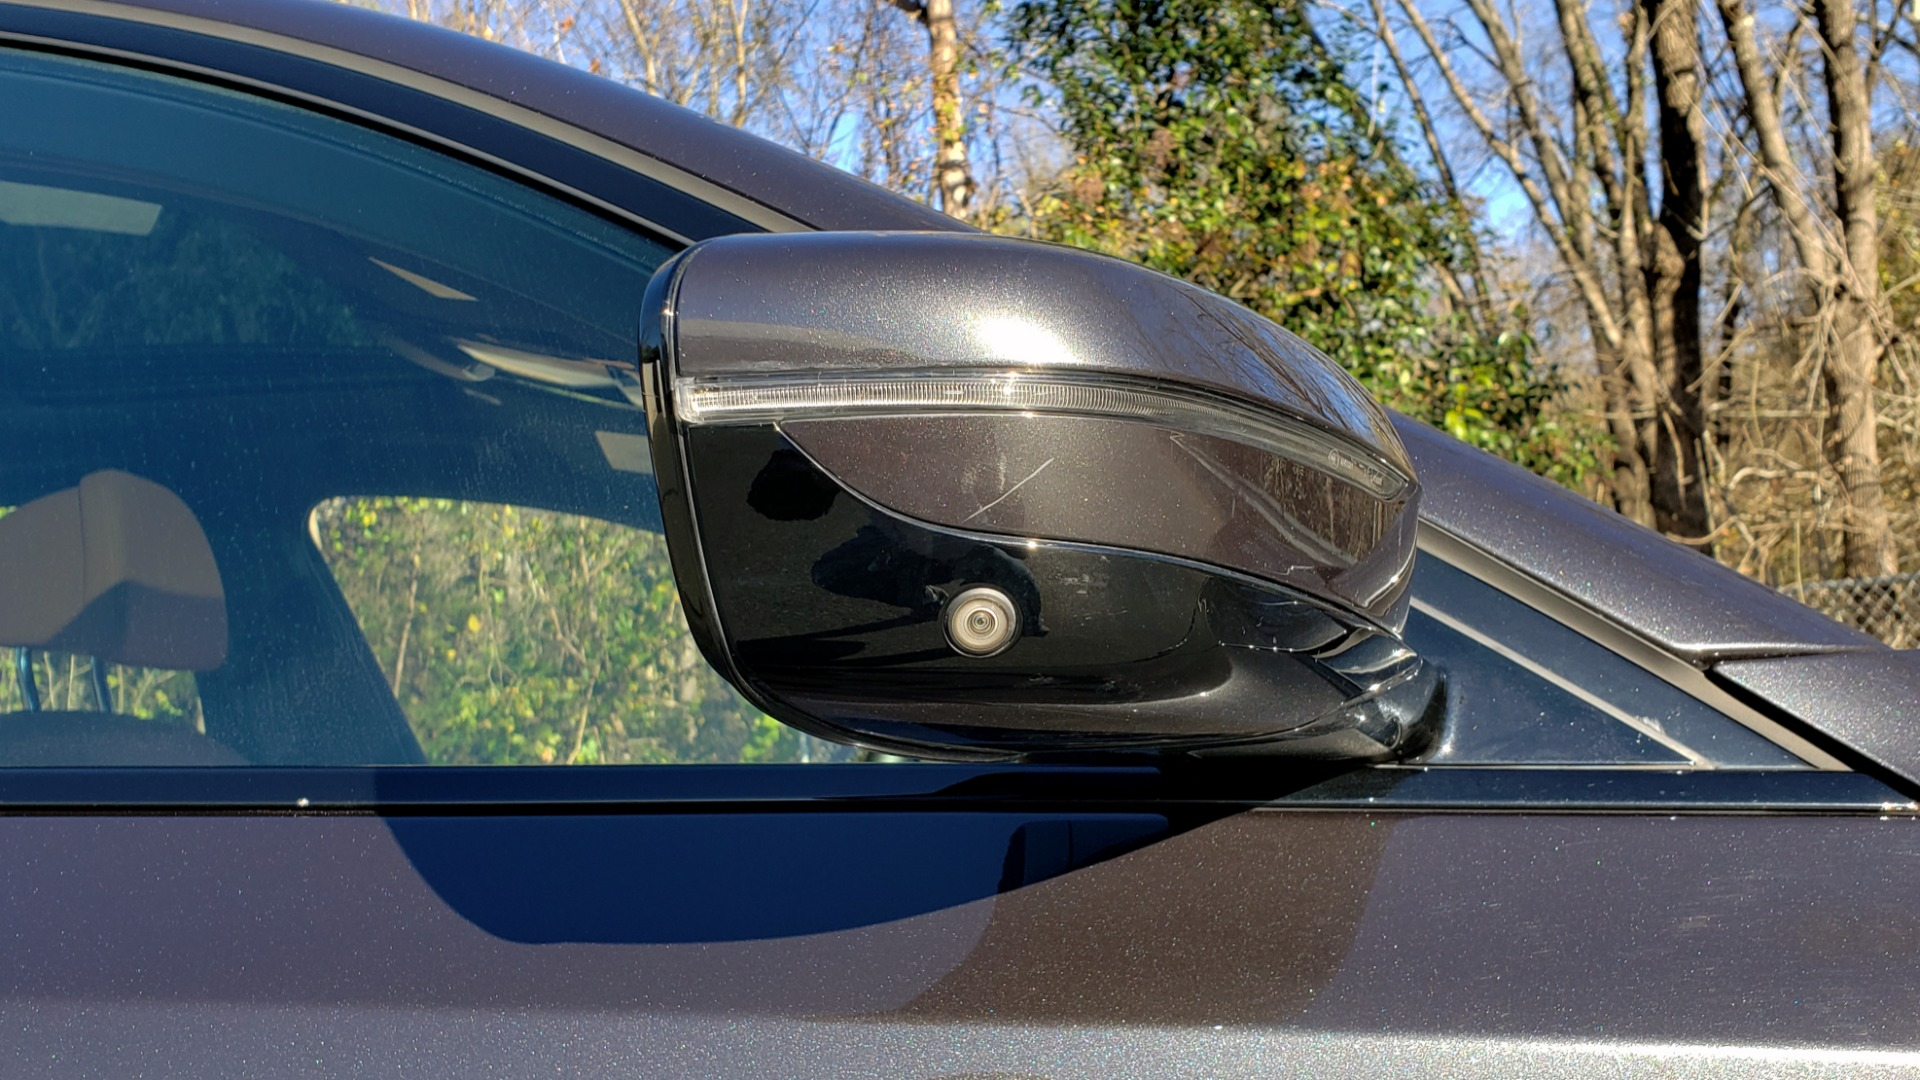 Used 2018 BMW 5 SERIES 540I M-SPORT / DRVR ASST / EXEC PKG / NAV / SUNROOF / HUD / REARVIEW for sale Sold at Formula Imports in Charlotte NC 28227 10